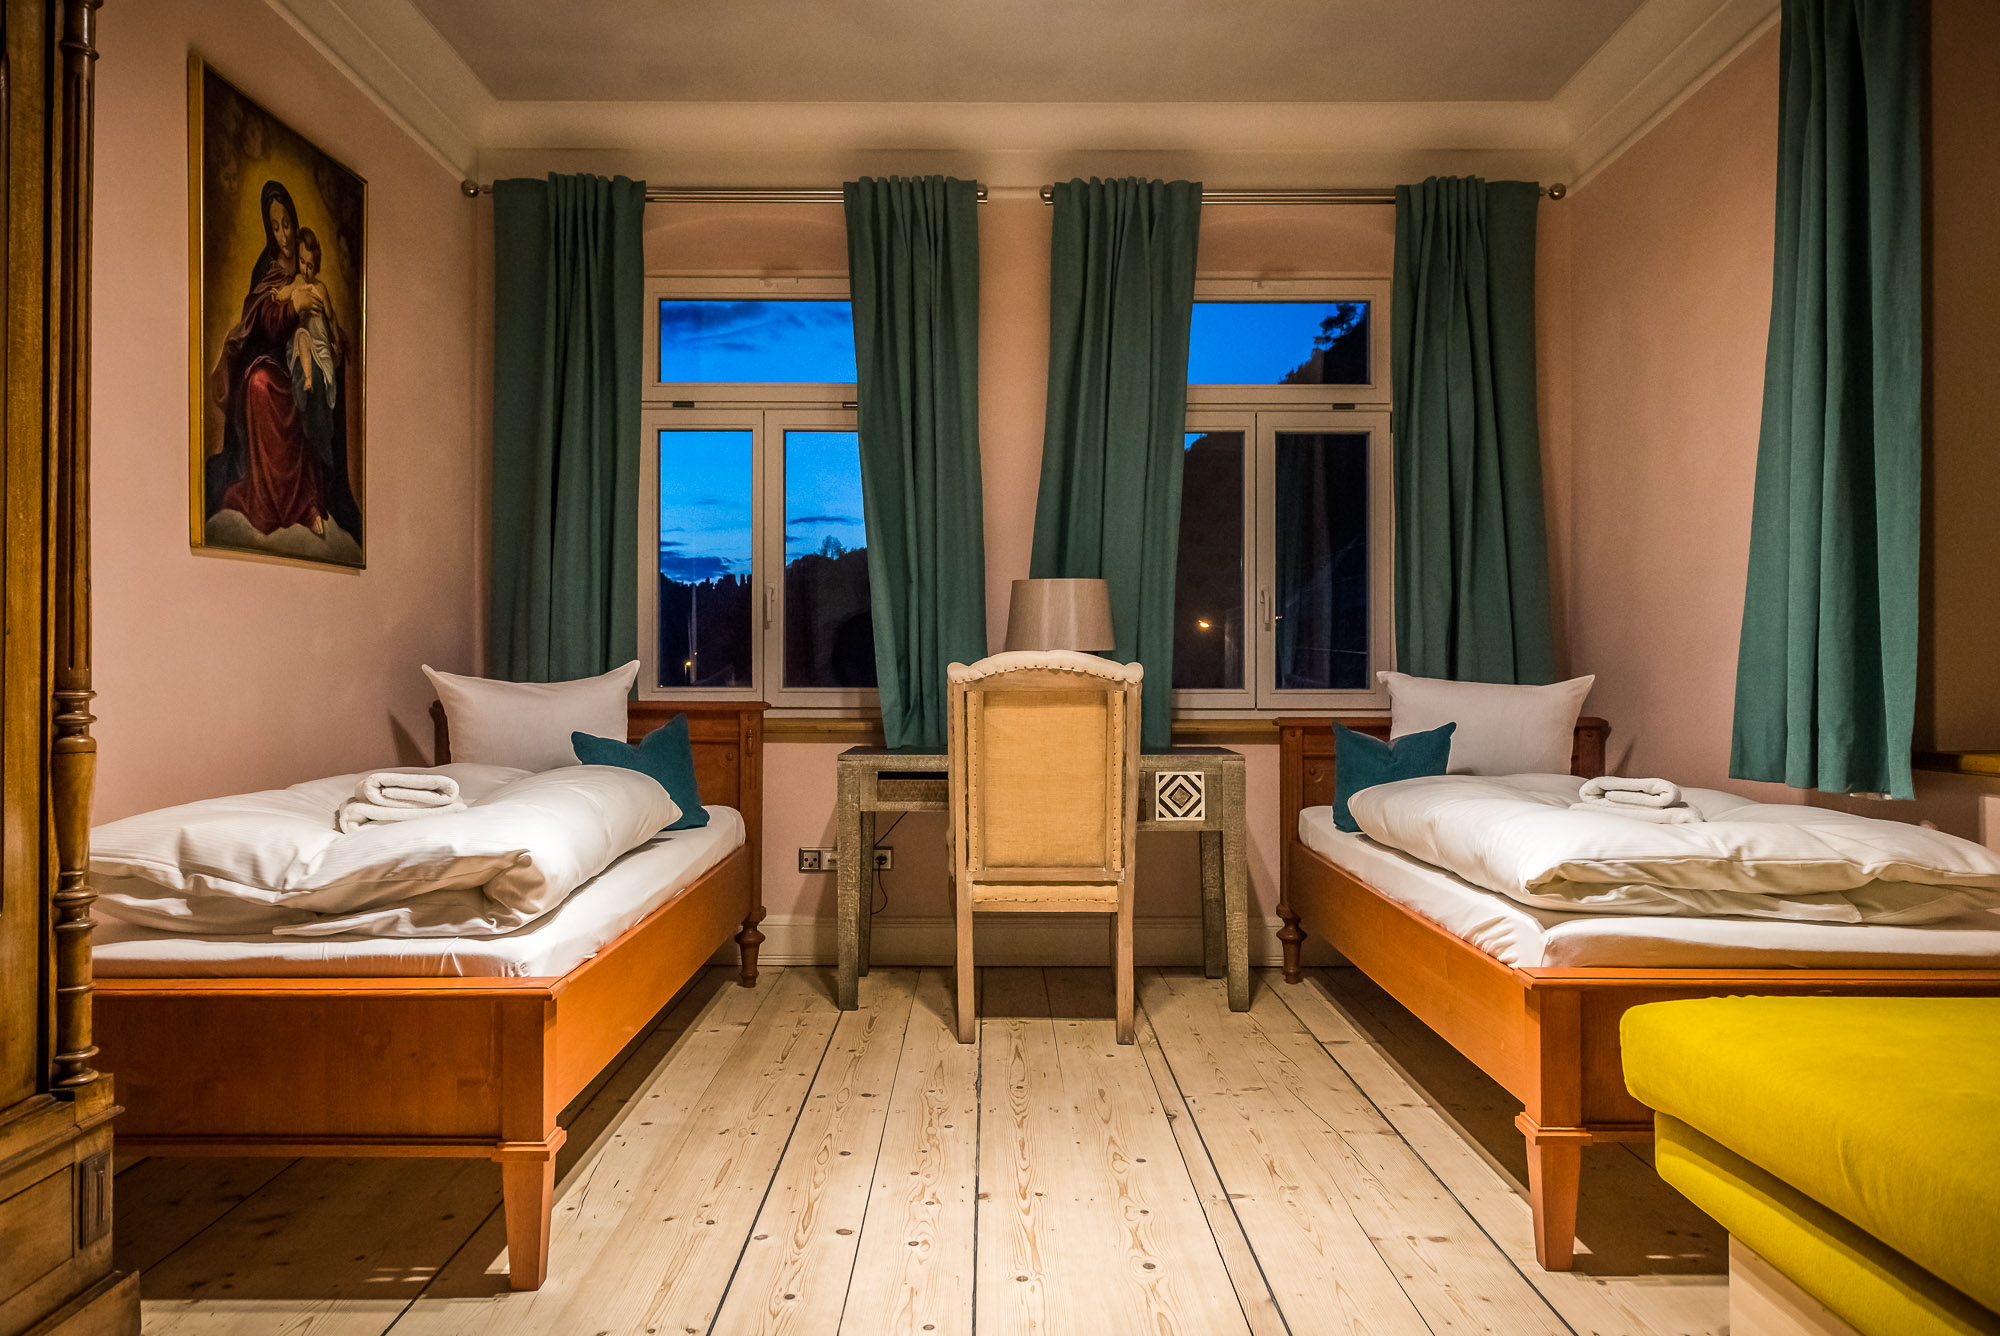 Villa Thusnelda Zimmereinrichtung ©Achim Meurer